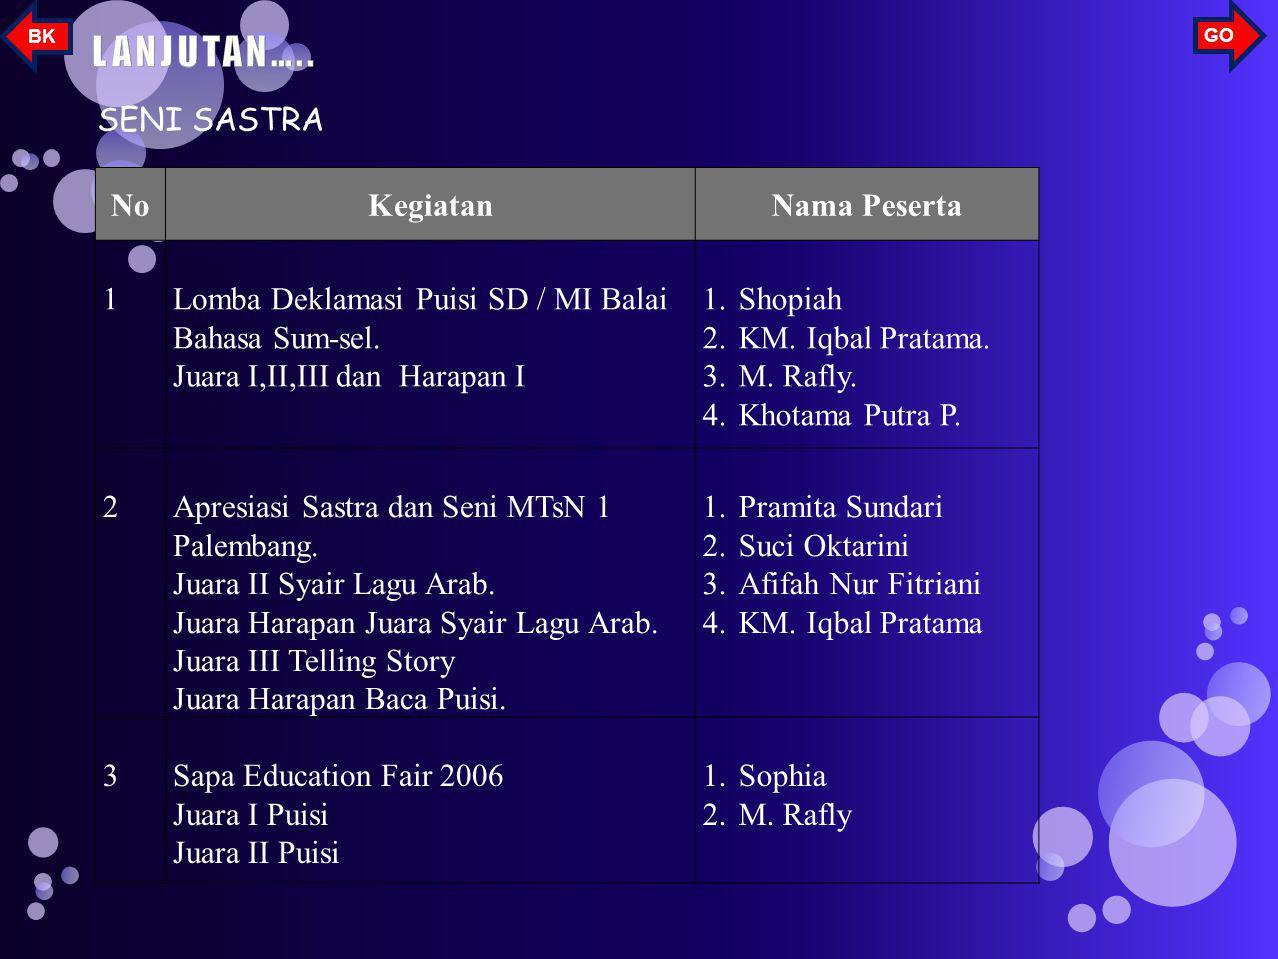 5Perkemahan Silaturahmi MTsN 2 Palembang Juara Umum I Putra Juara Umum II Putri 1.M. Rafly 2.KM. Iqbal P. 3.Aulya Syafei 4.M. Rama Nurrohim 5.M. Iqbal